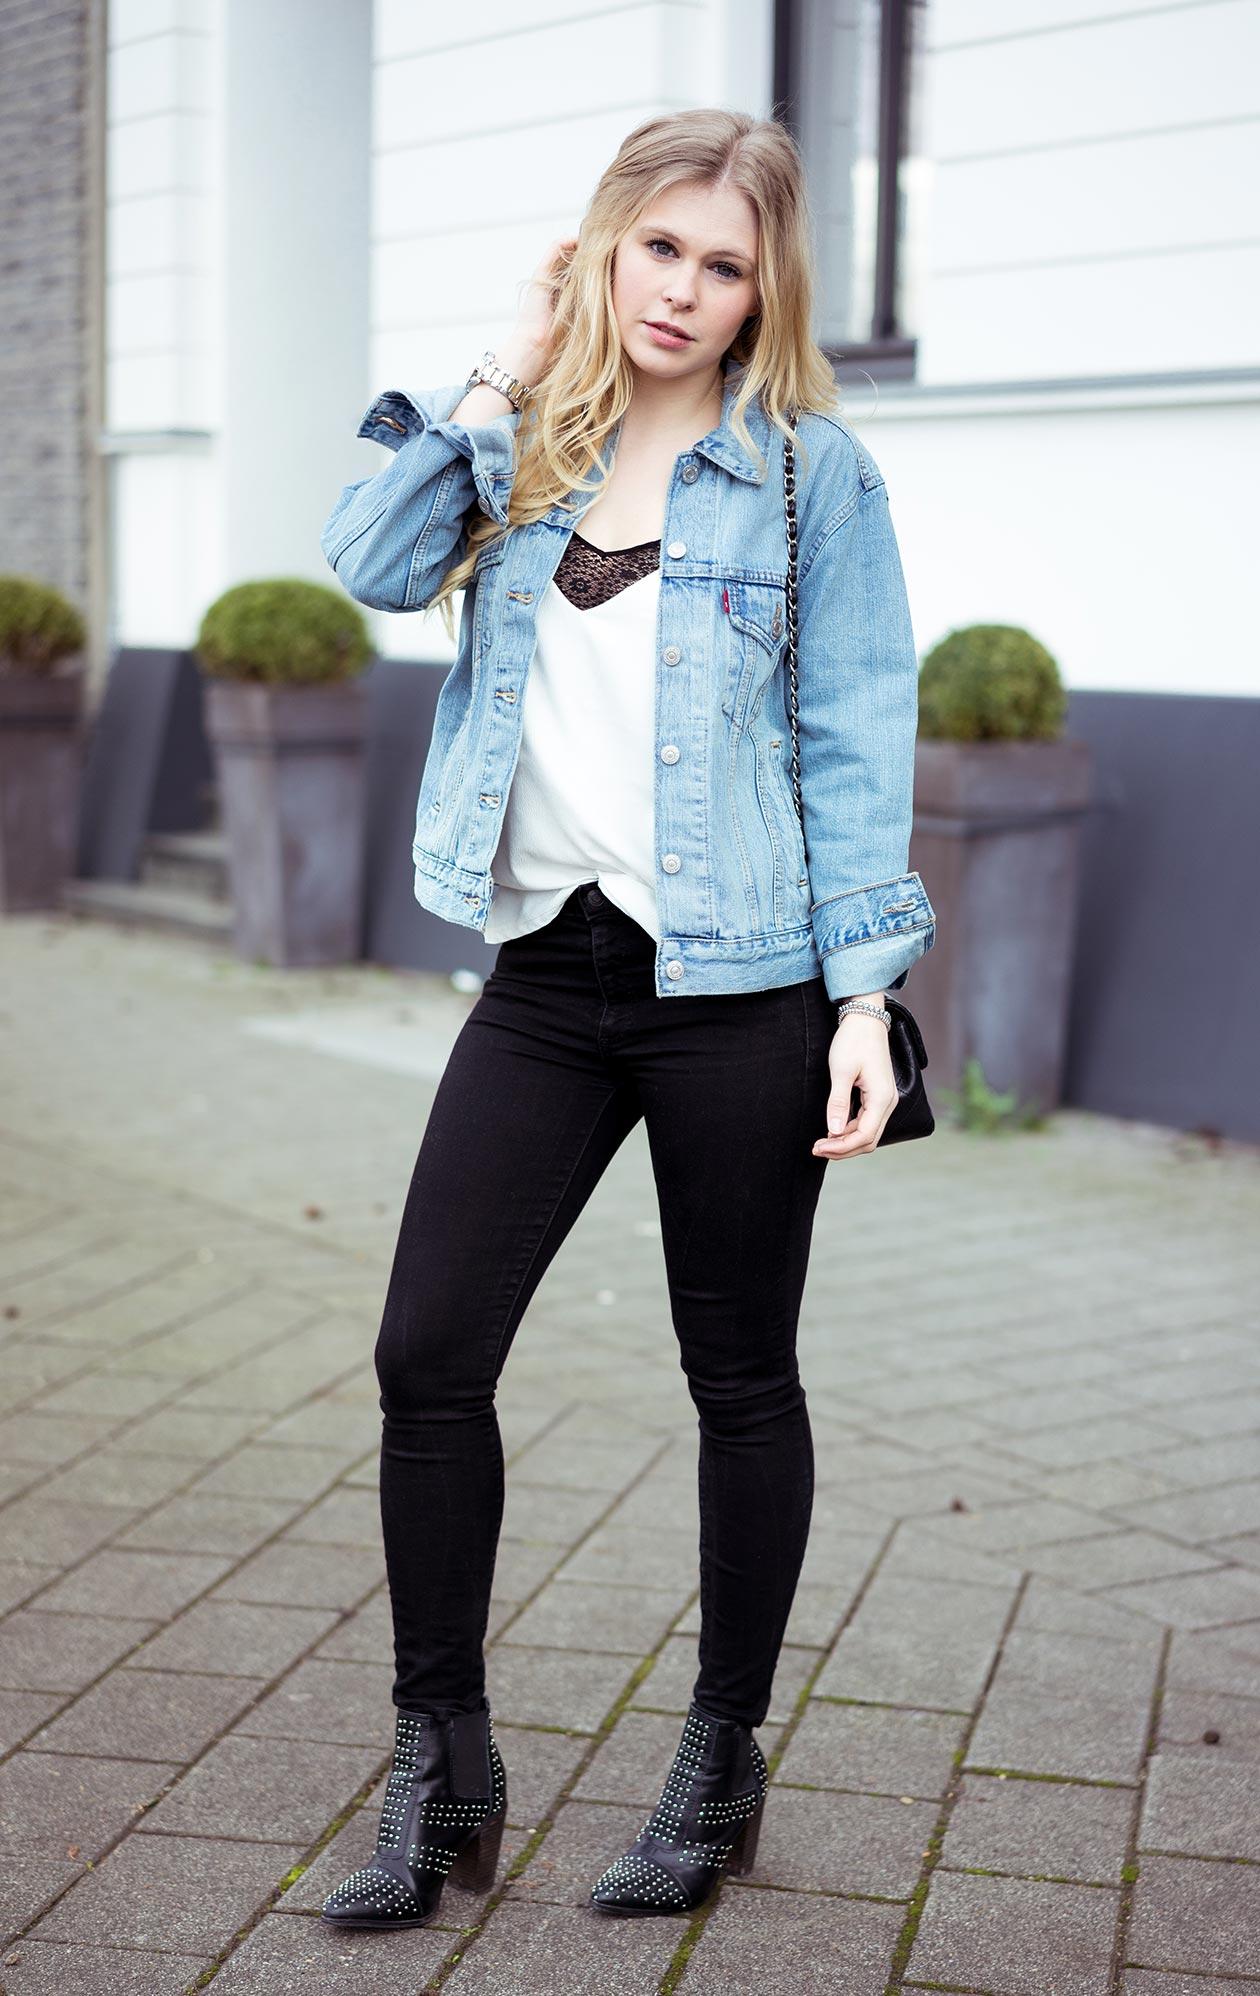 Oversize Jeansjacke Outfit Levis Blog Sunnyinga Modeblog